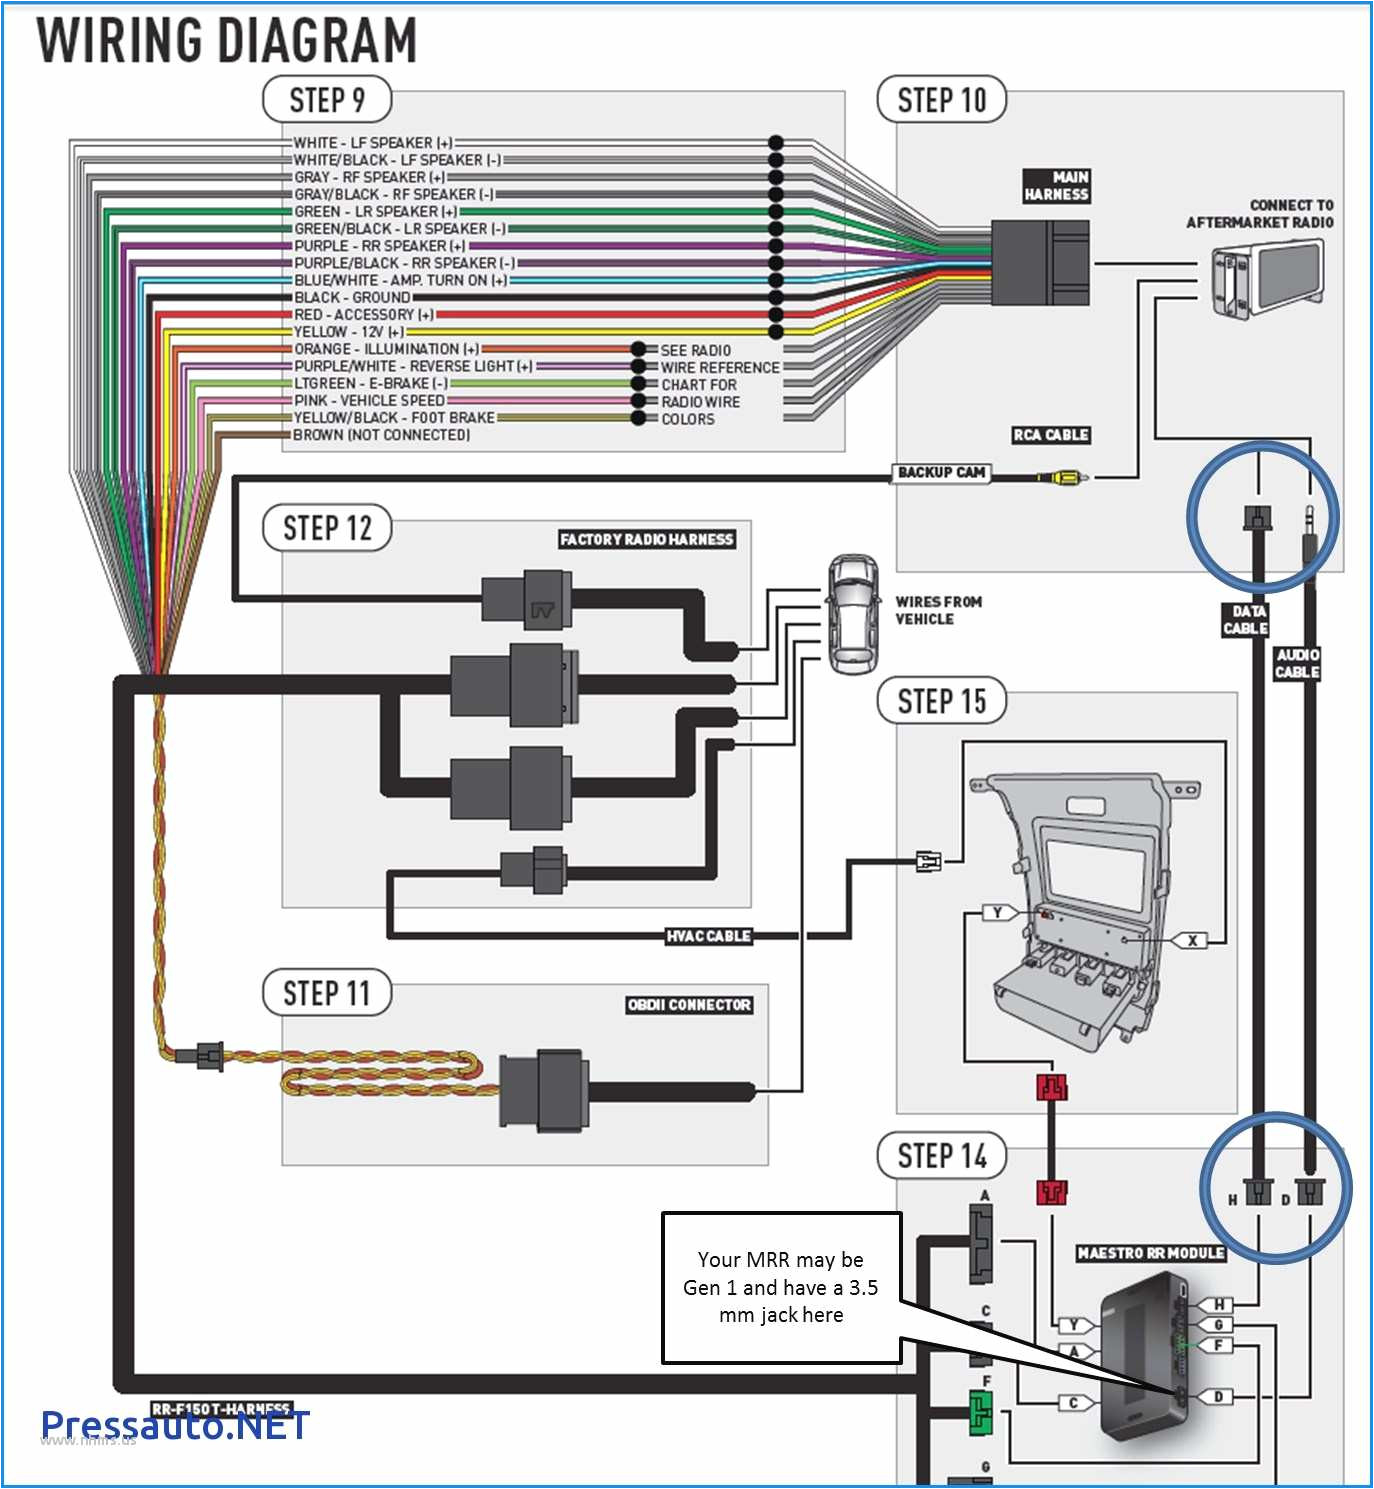 pioneer avic d3 wiring diagram awesome pioneer avh wiring harness diagram simple guide about wiring diagram e280a2 image of pioneer avic d3 wiring diagram jpg